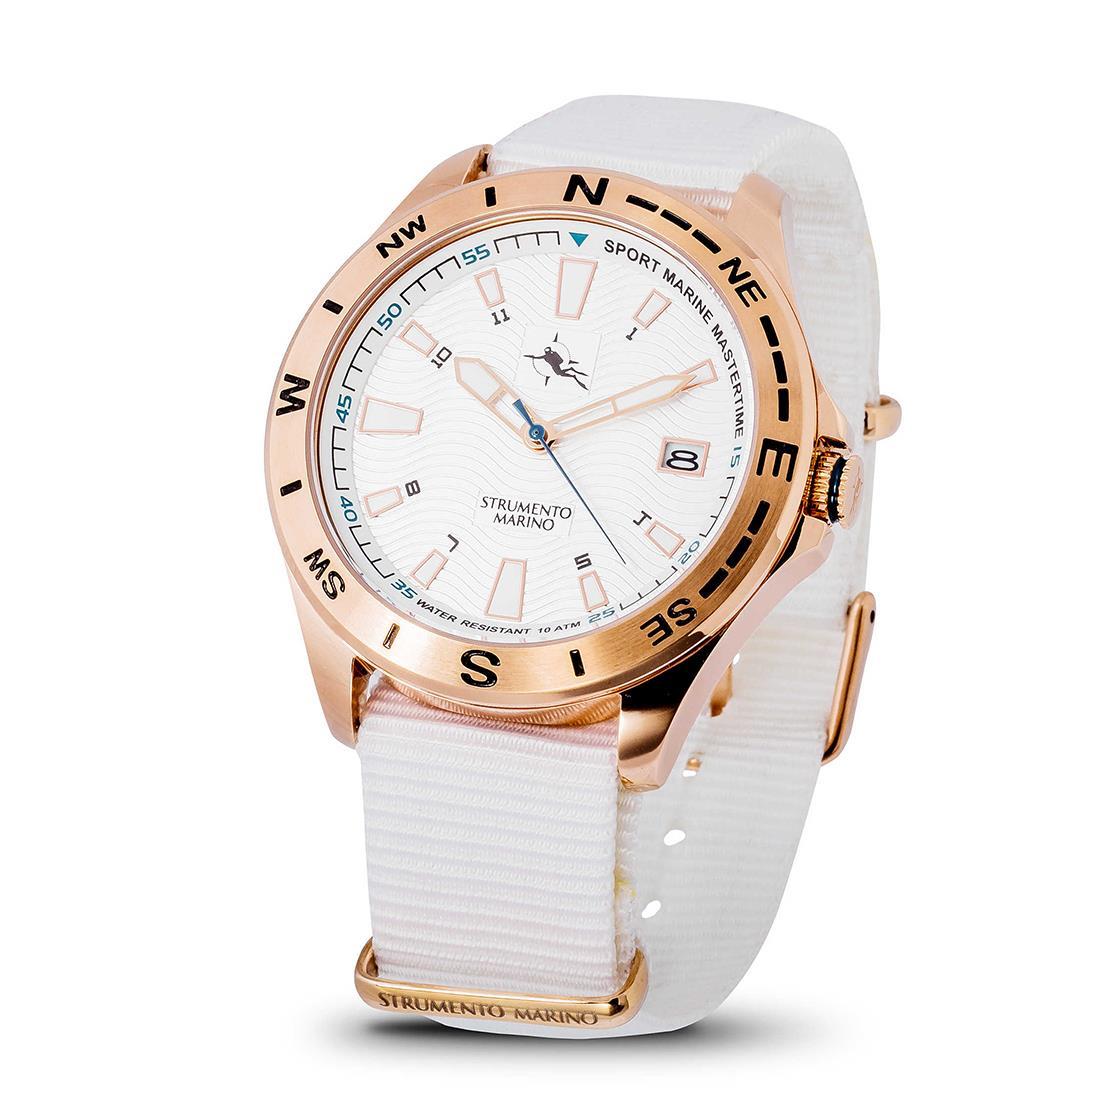 Reloj para hombre con caja de 45 mm - STRUMENTO MARINO